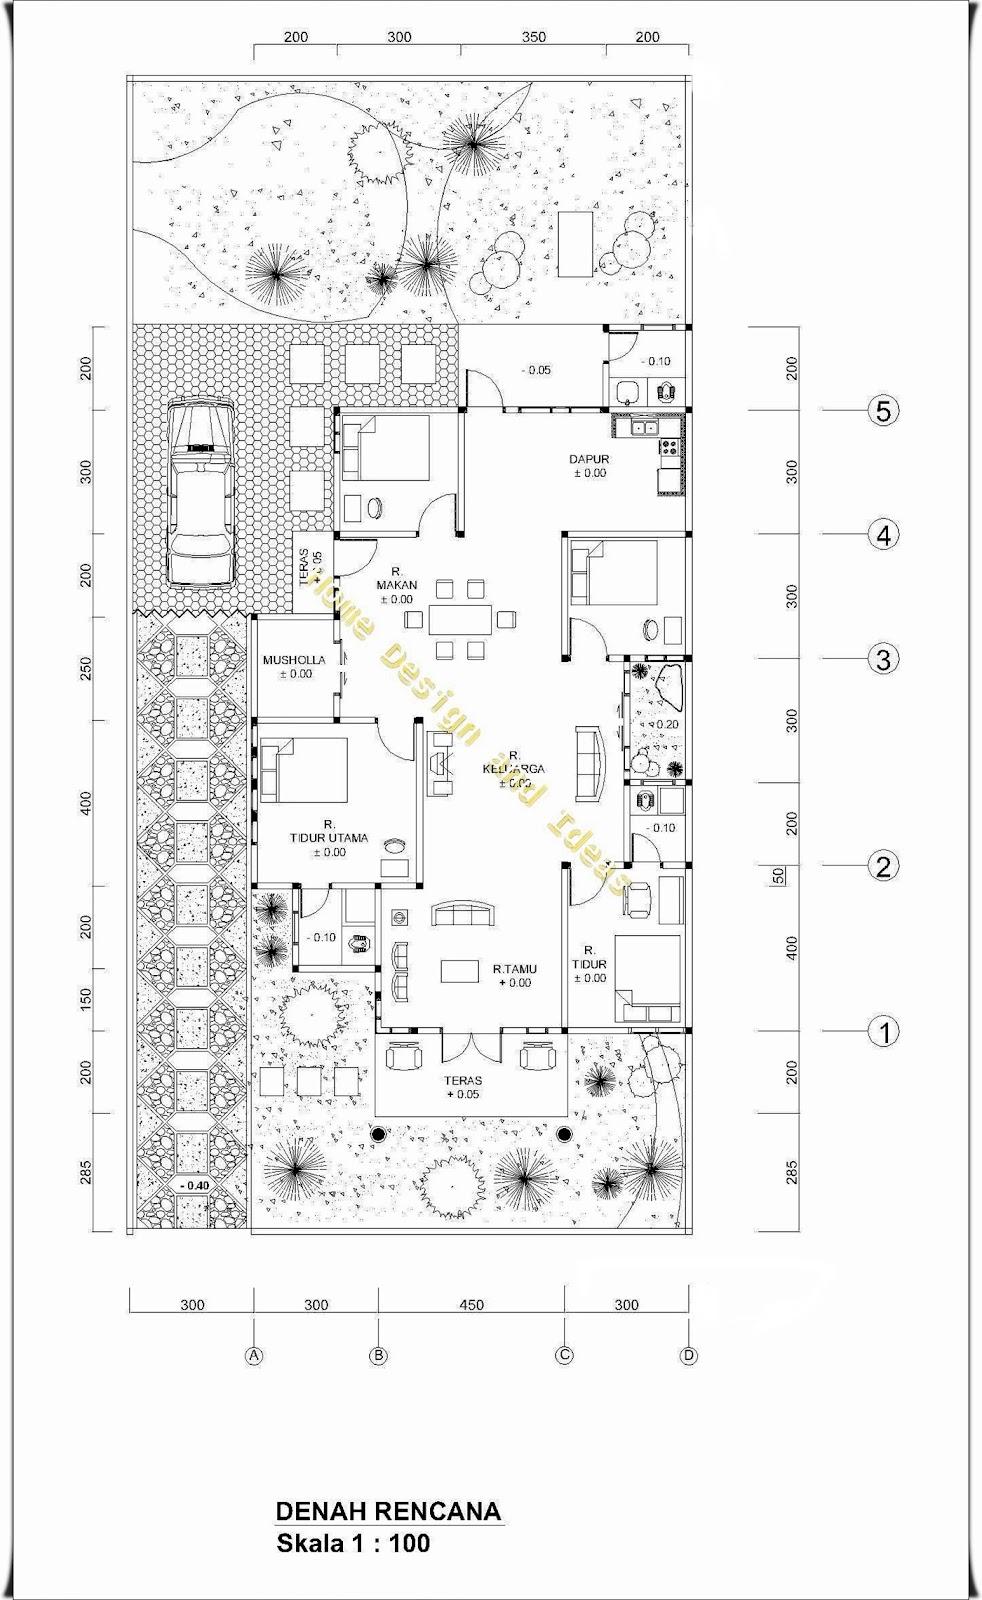 denah rumah ukuran 10 5 m x 17 m dengan tanah uk 13 5 m x